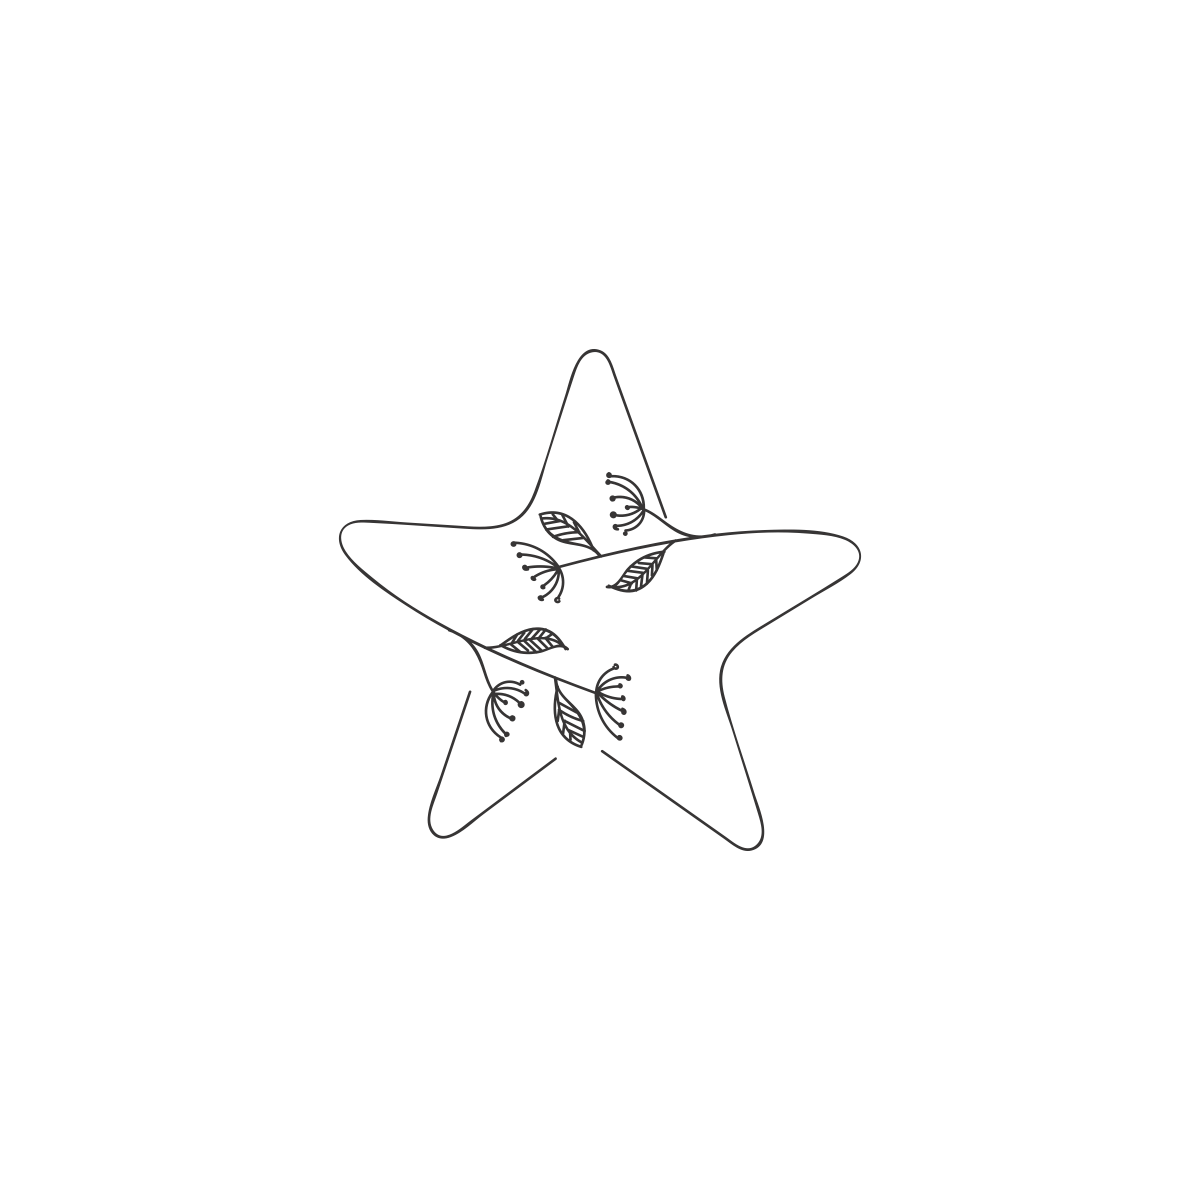 Sophisticated Design for Star